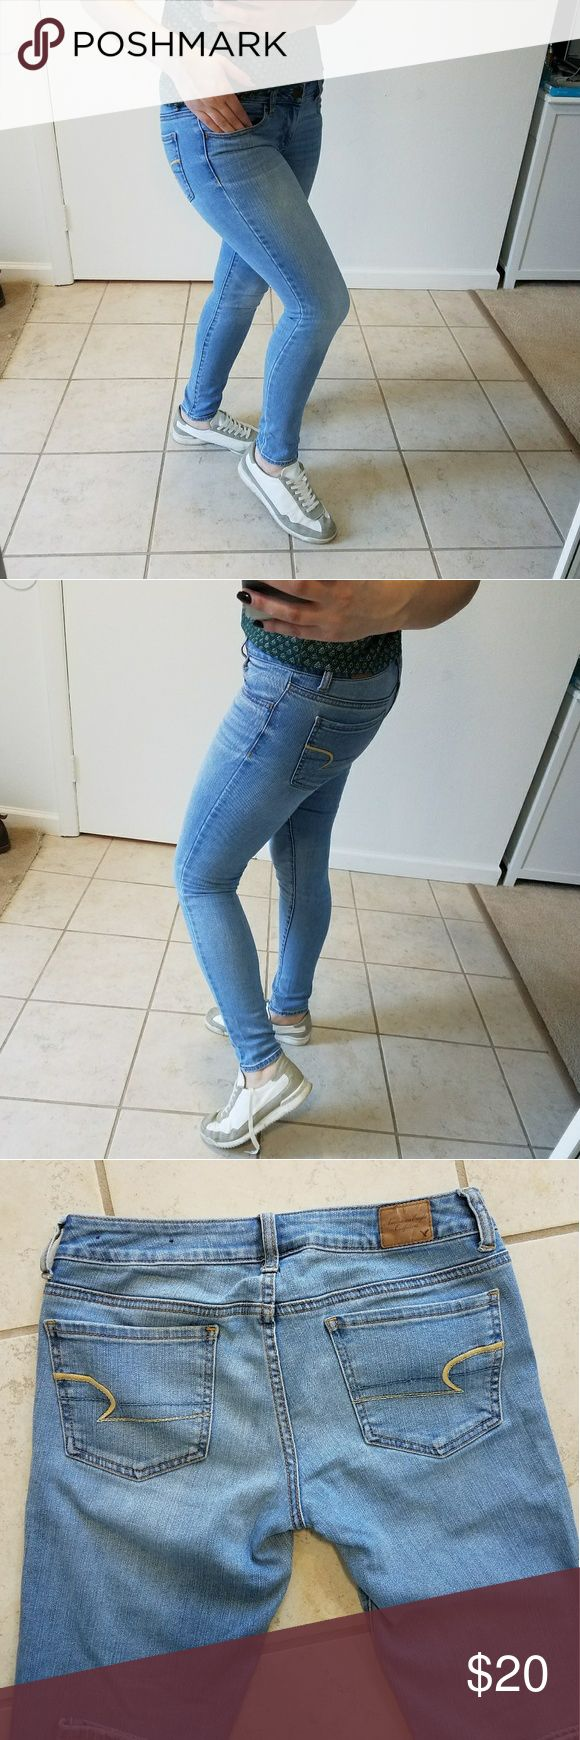 17 Best Ideas About Light Blue Jeans On Pinterest | Light Blue Jeans Outfit Skinny Jeans ...